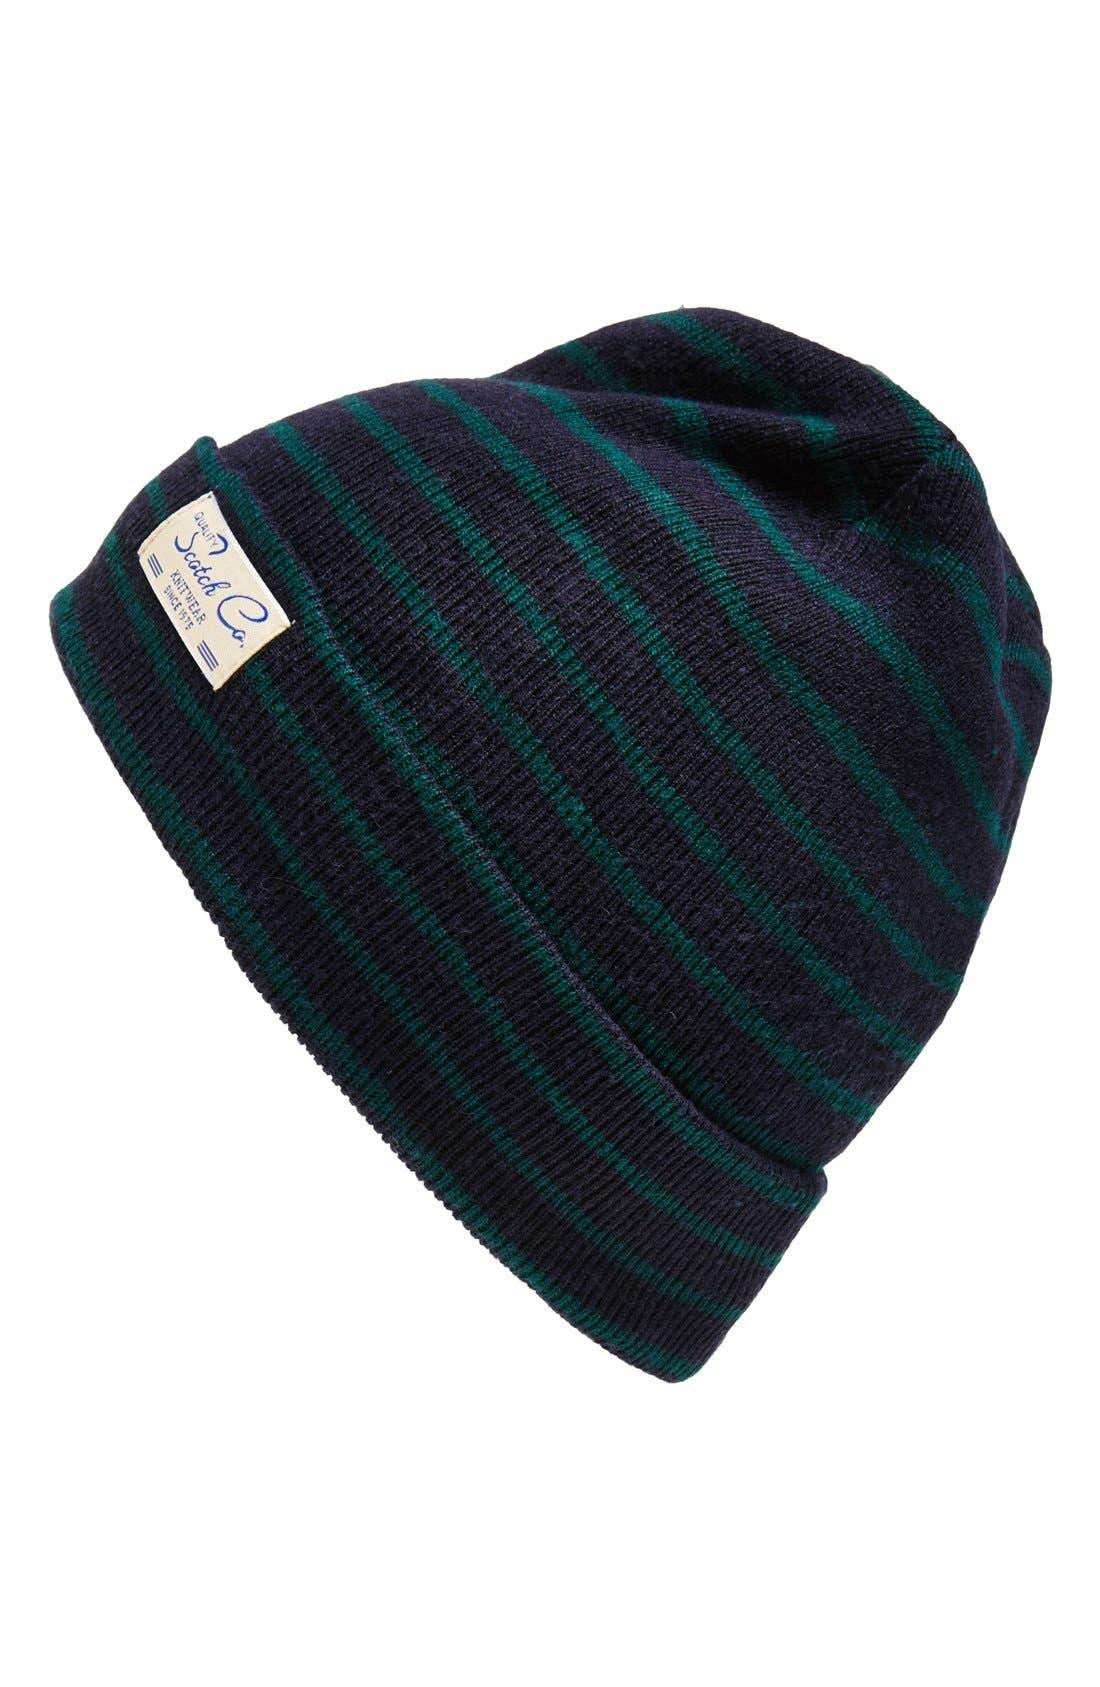 Main Image - Scotch & Soda Stripe Knit Cap